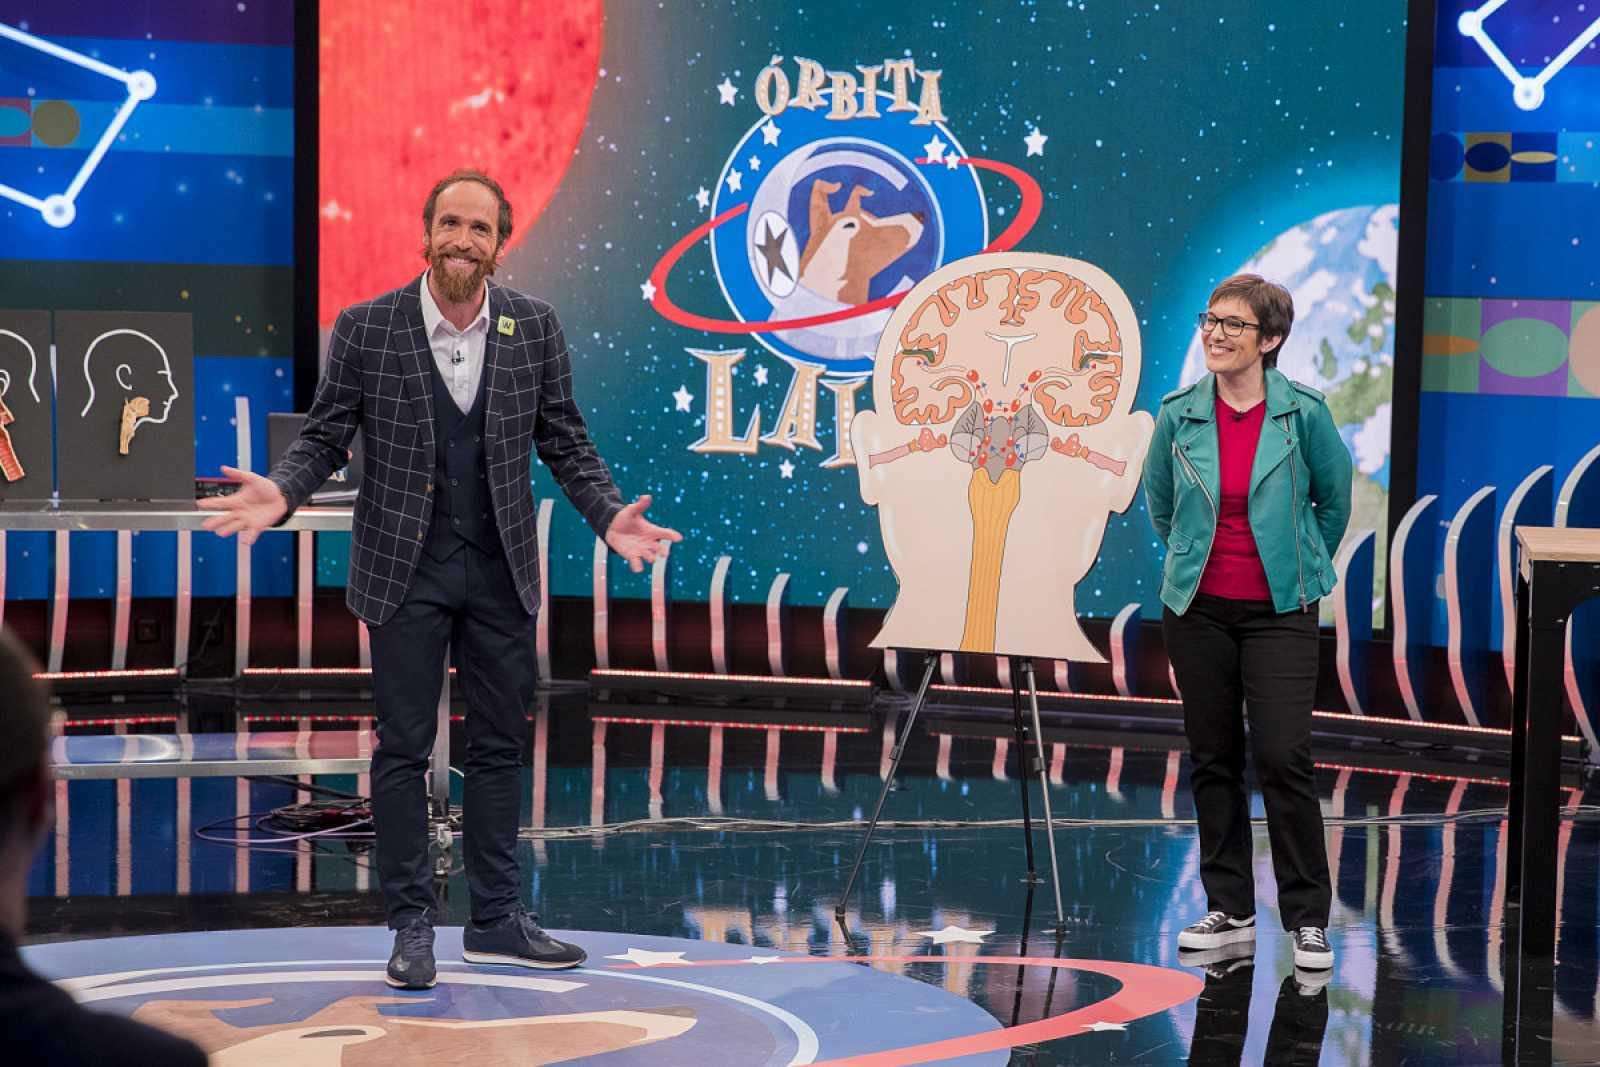 Edu Sáenz de Cabezón y Carmen Agustín hablan de música desde la neurociencia en Órbita Laika